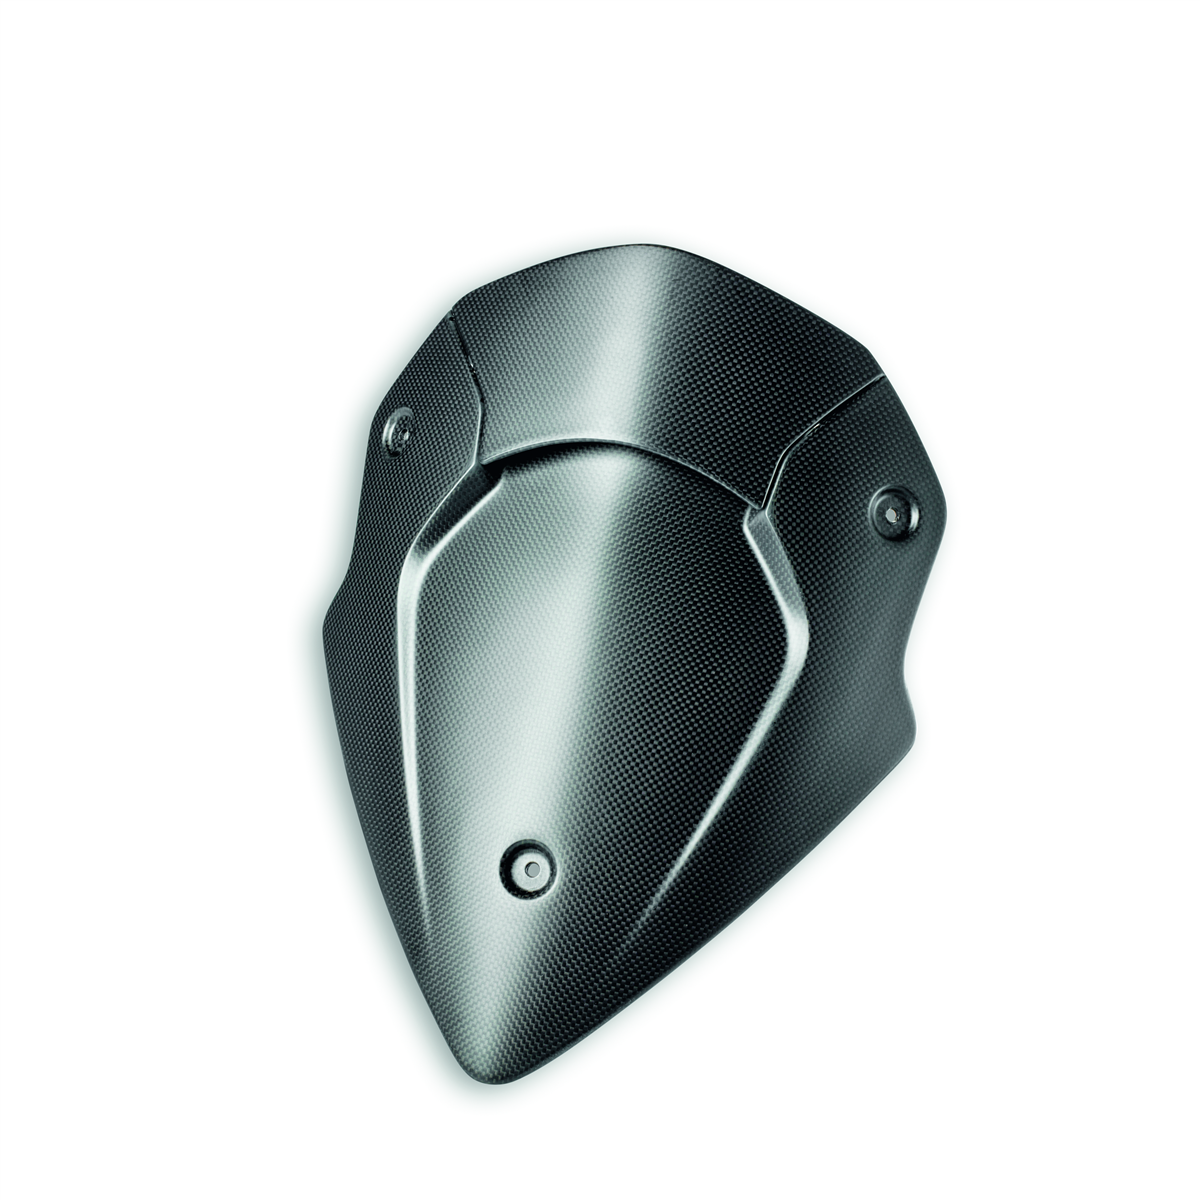 Carbon headlight fairing.